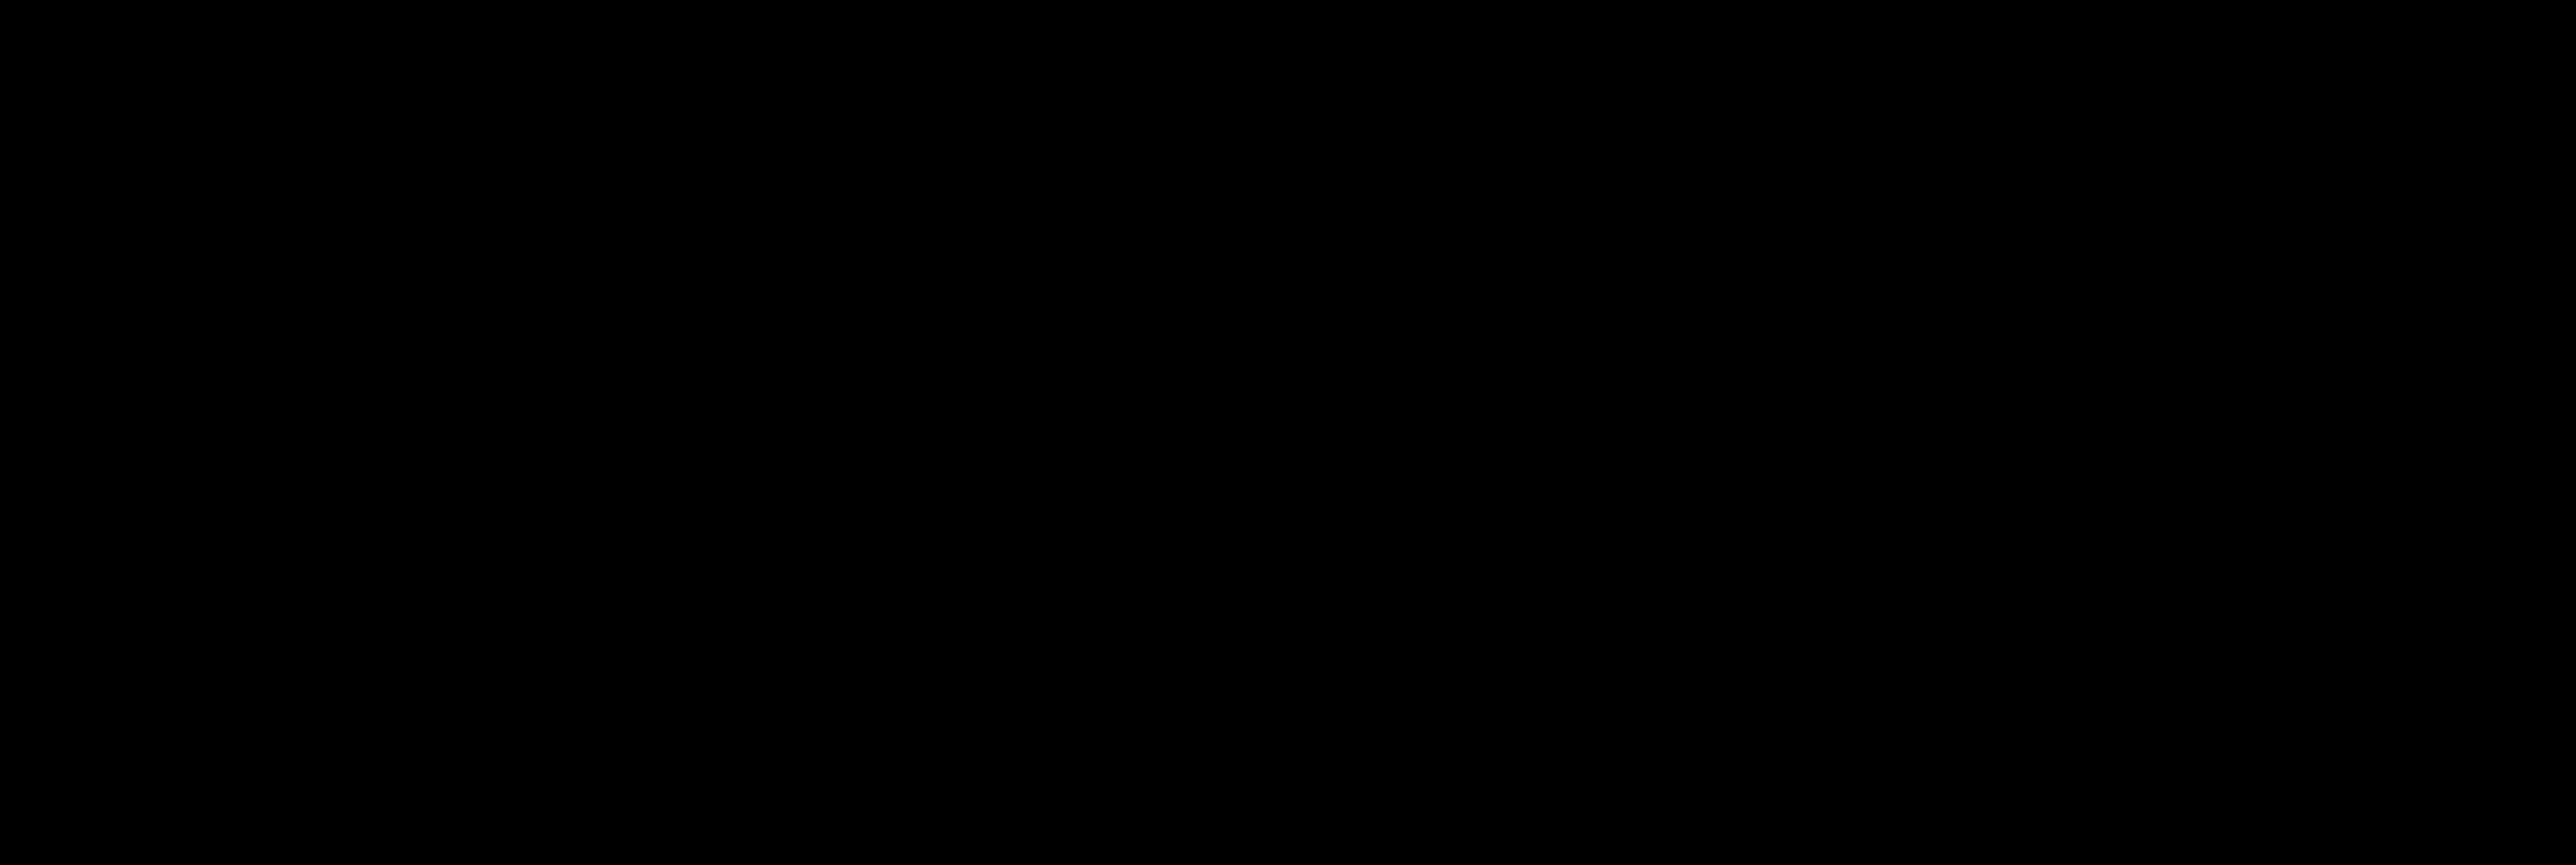 Variant – Commercial – 2018 P3 (445x180x103 cm)